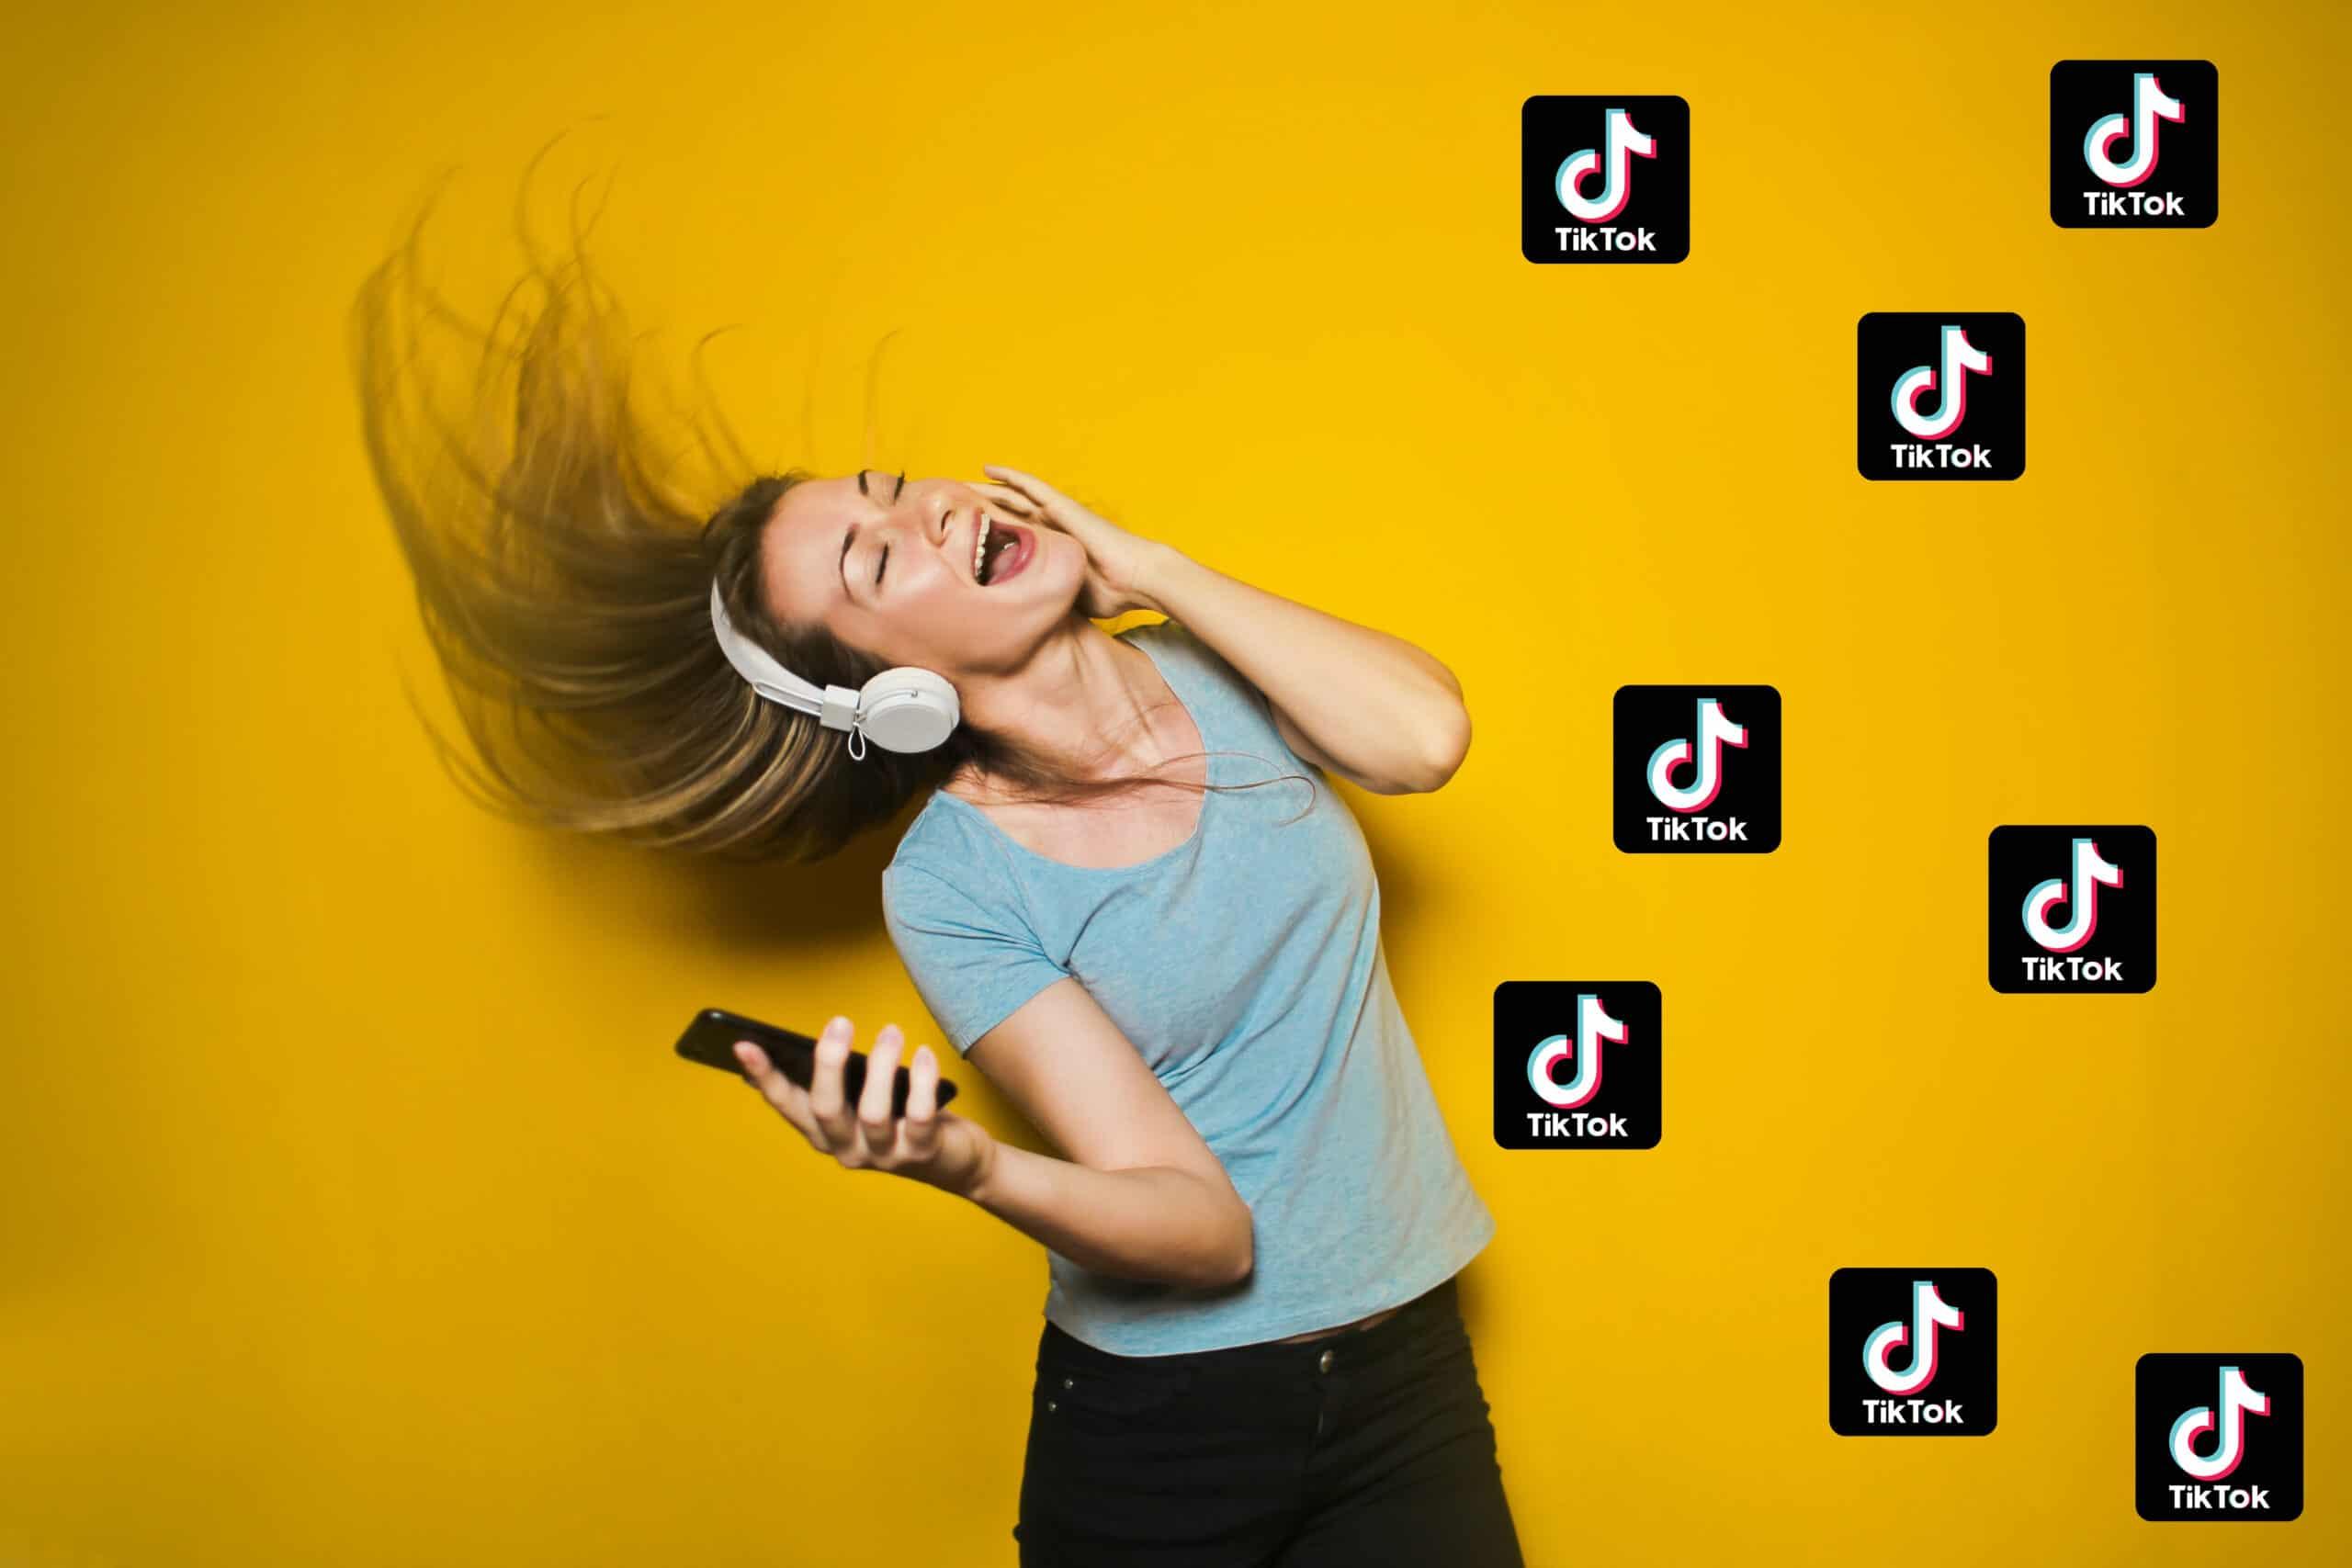 Viral videos με χορούς, τραγούδια και ατάκες στο Τικ Τοκ